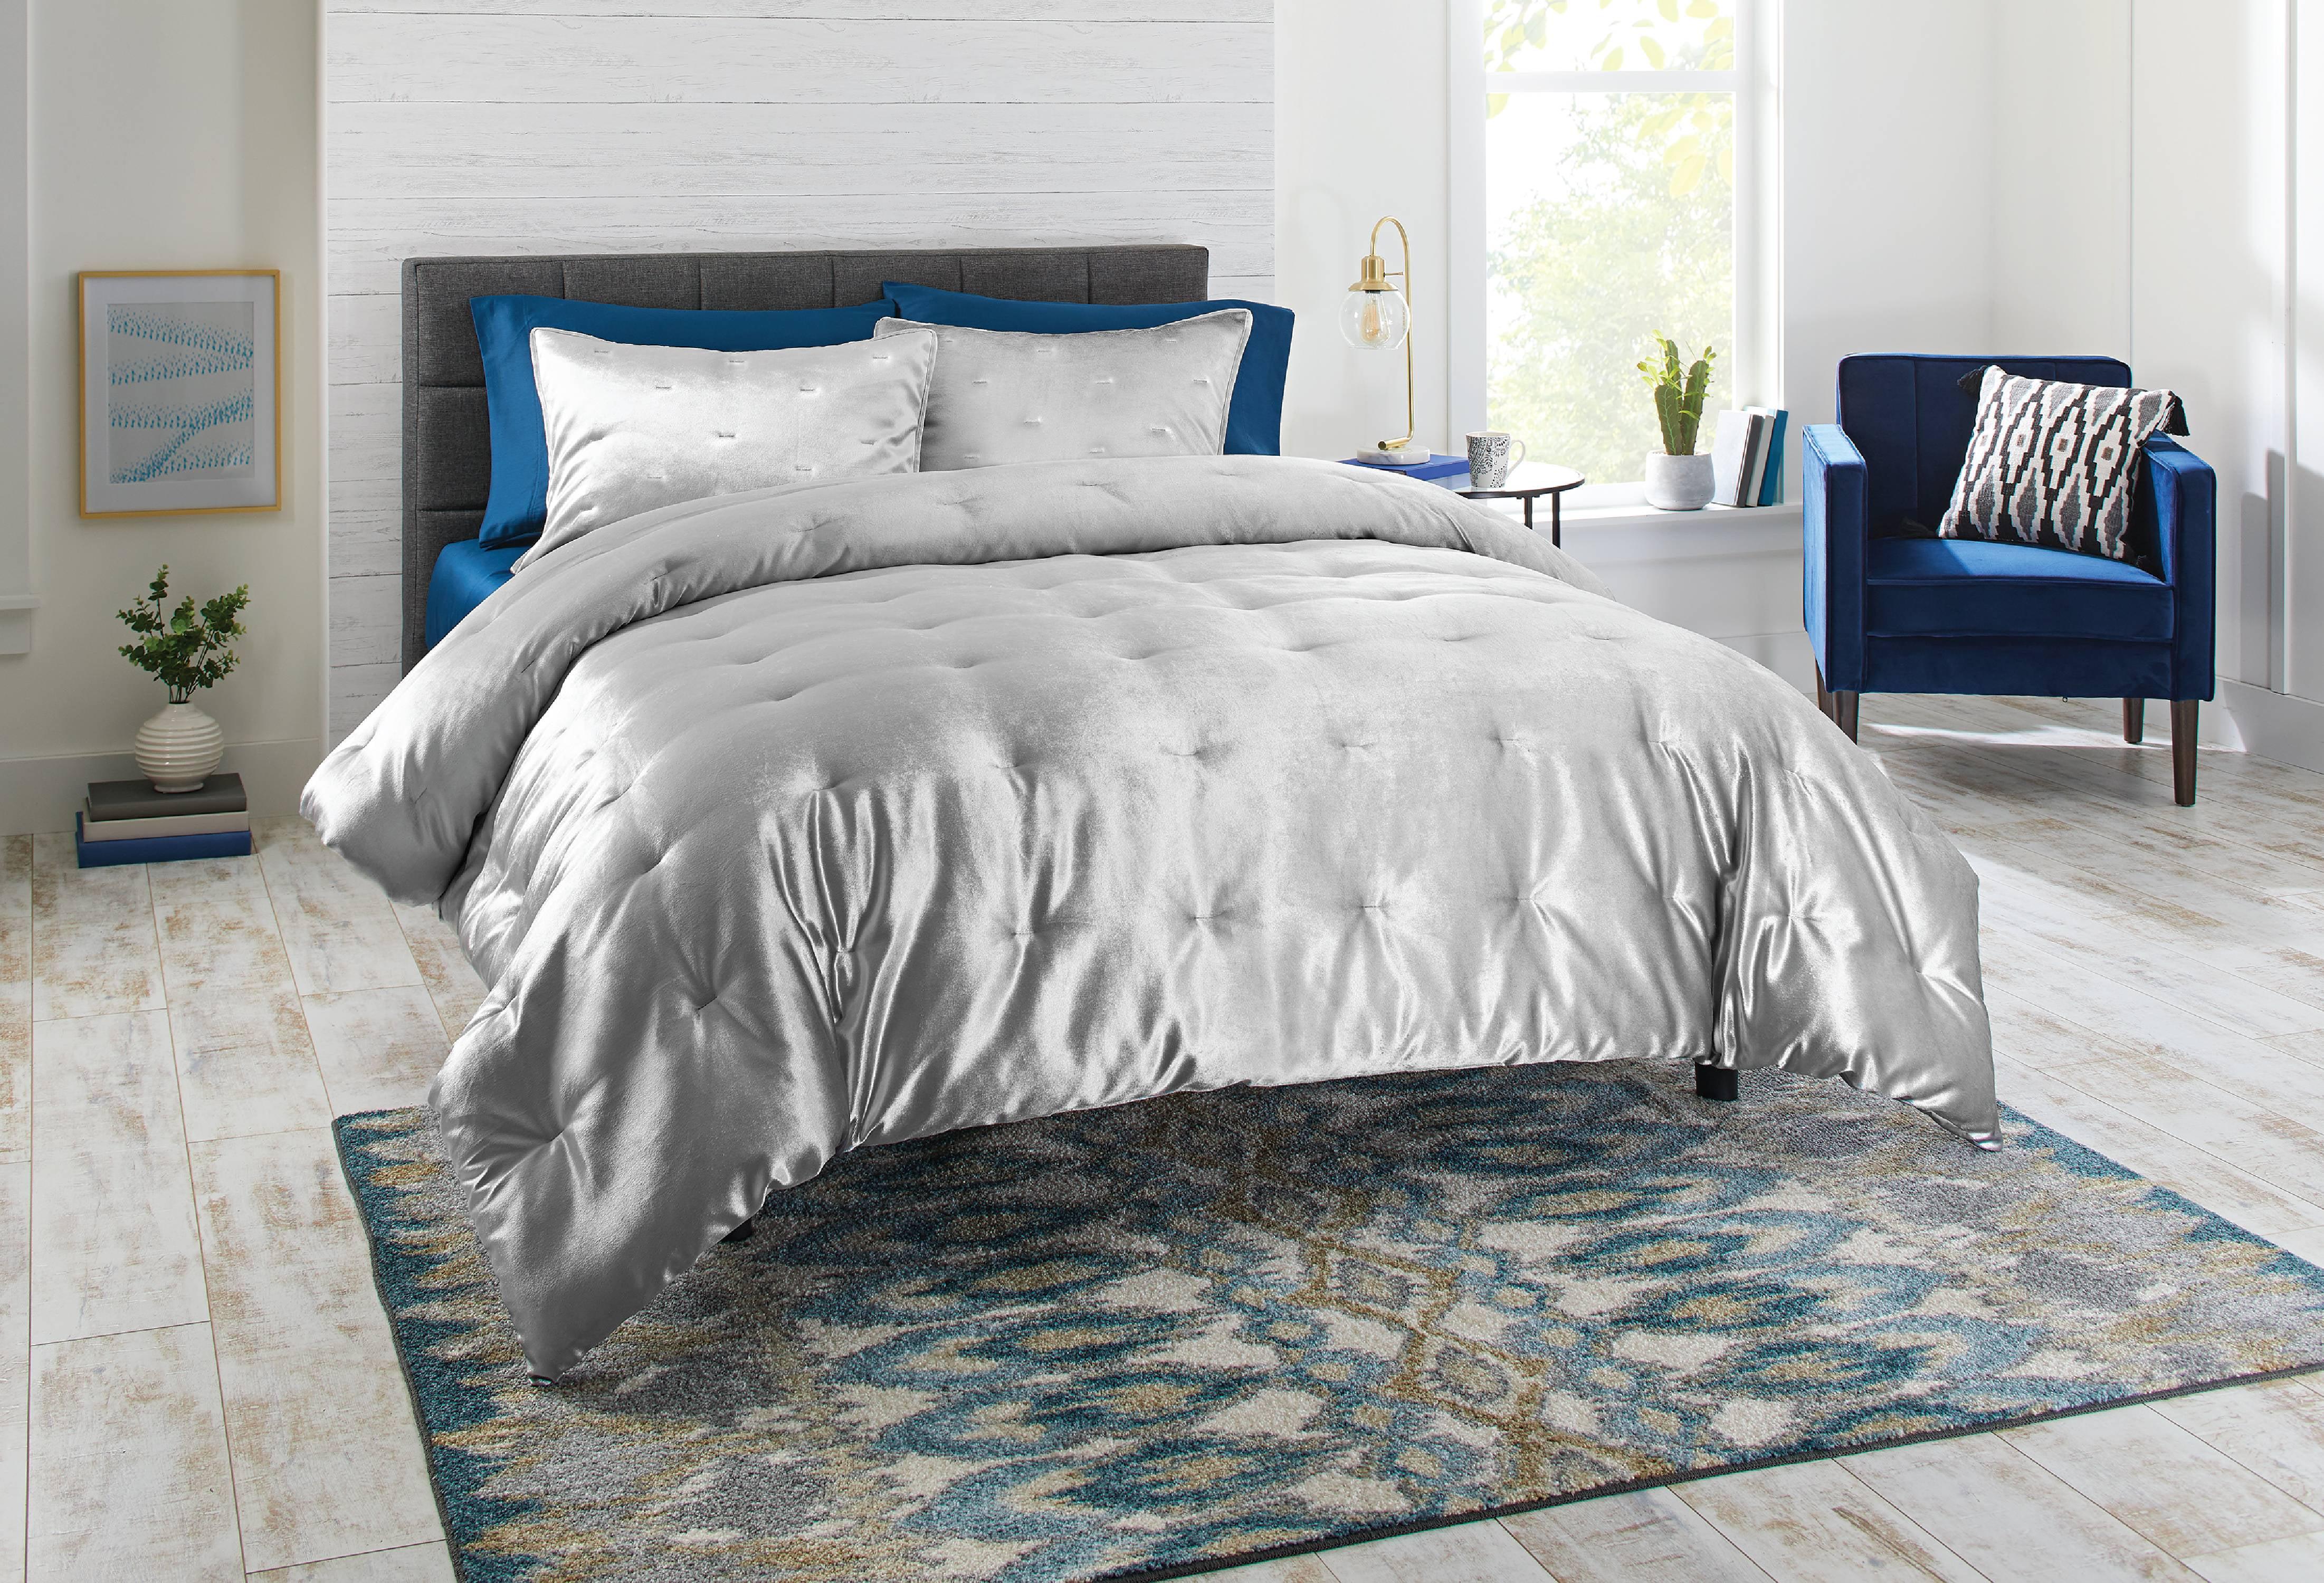 Lulu Coco Crushed Velvet Comforter Set Multiple Sizes Colors Comforters Sets